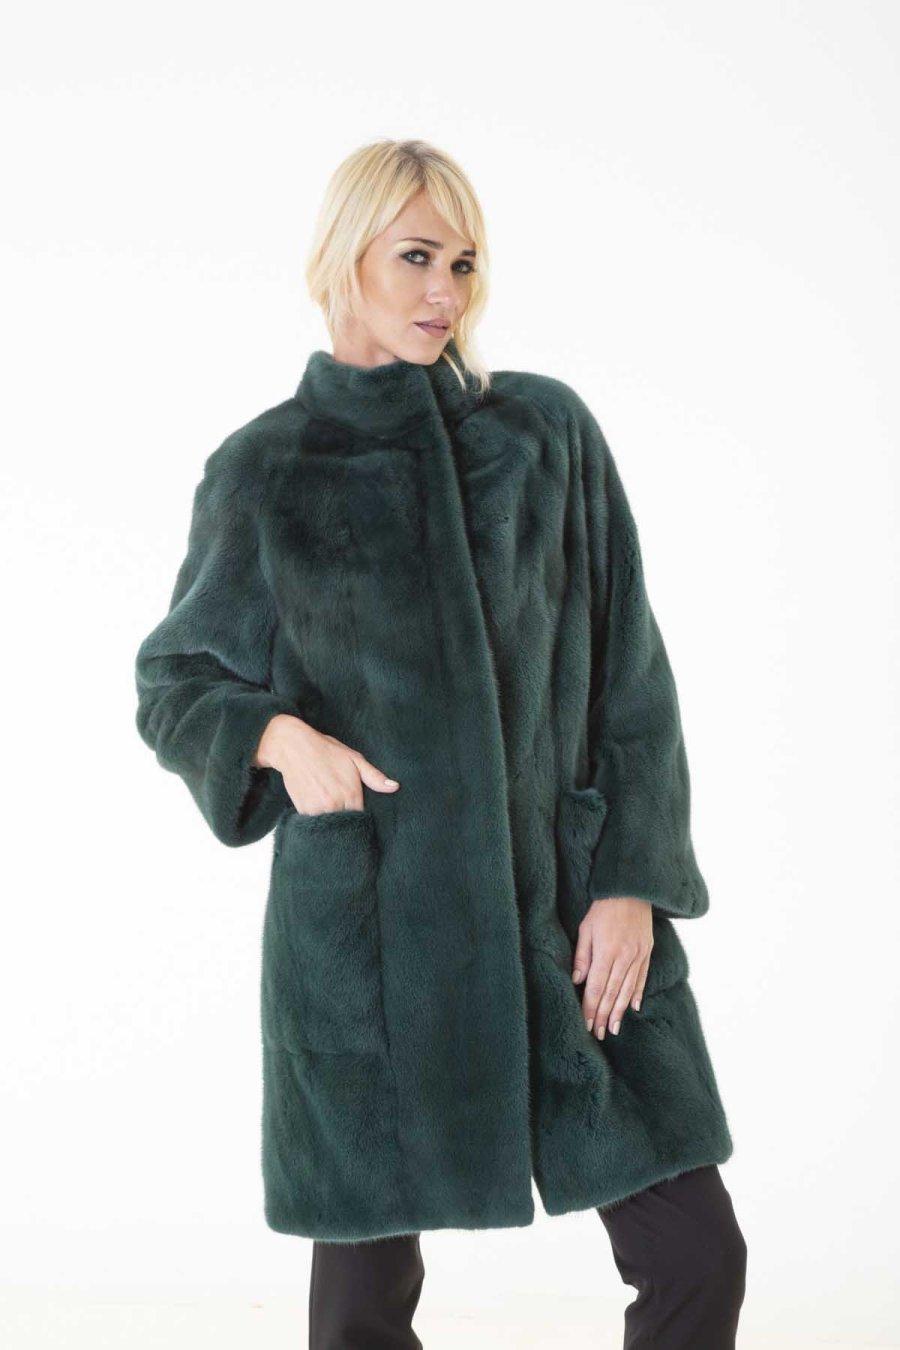 Shock Green Male Mink Fur Jacket   Пальто из норки цвета Shock Green - Sarigianni Furs